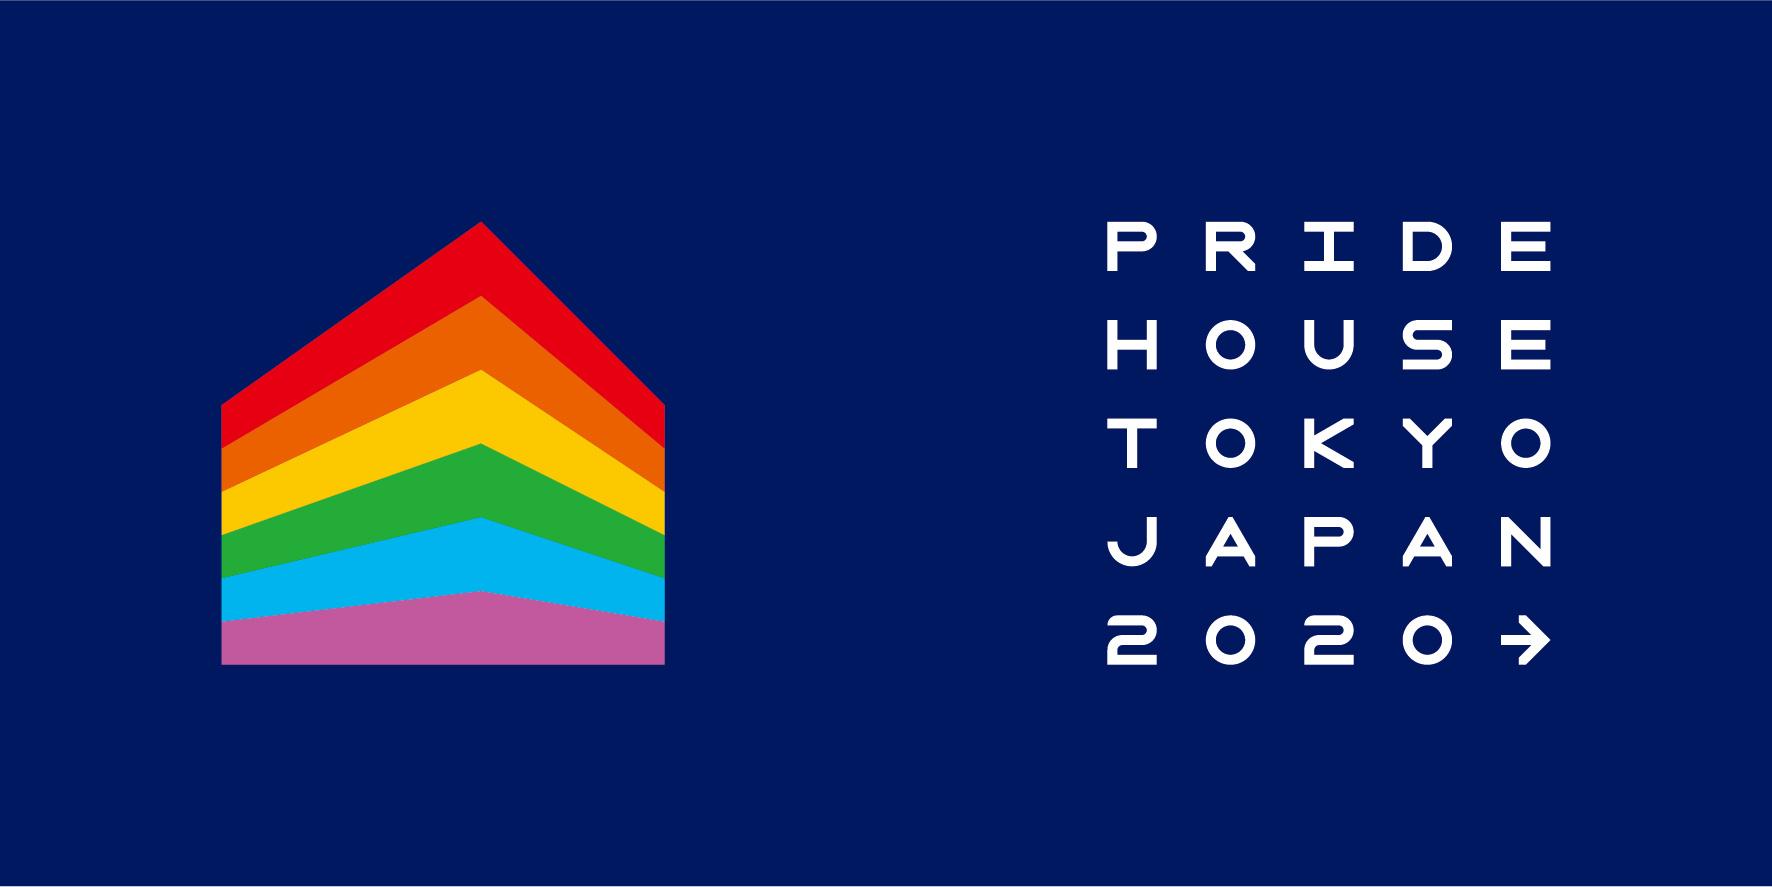 pridehousetokyologo_yoko_rgb